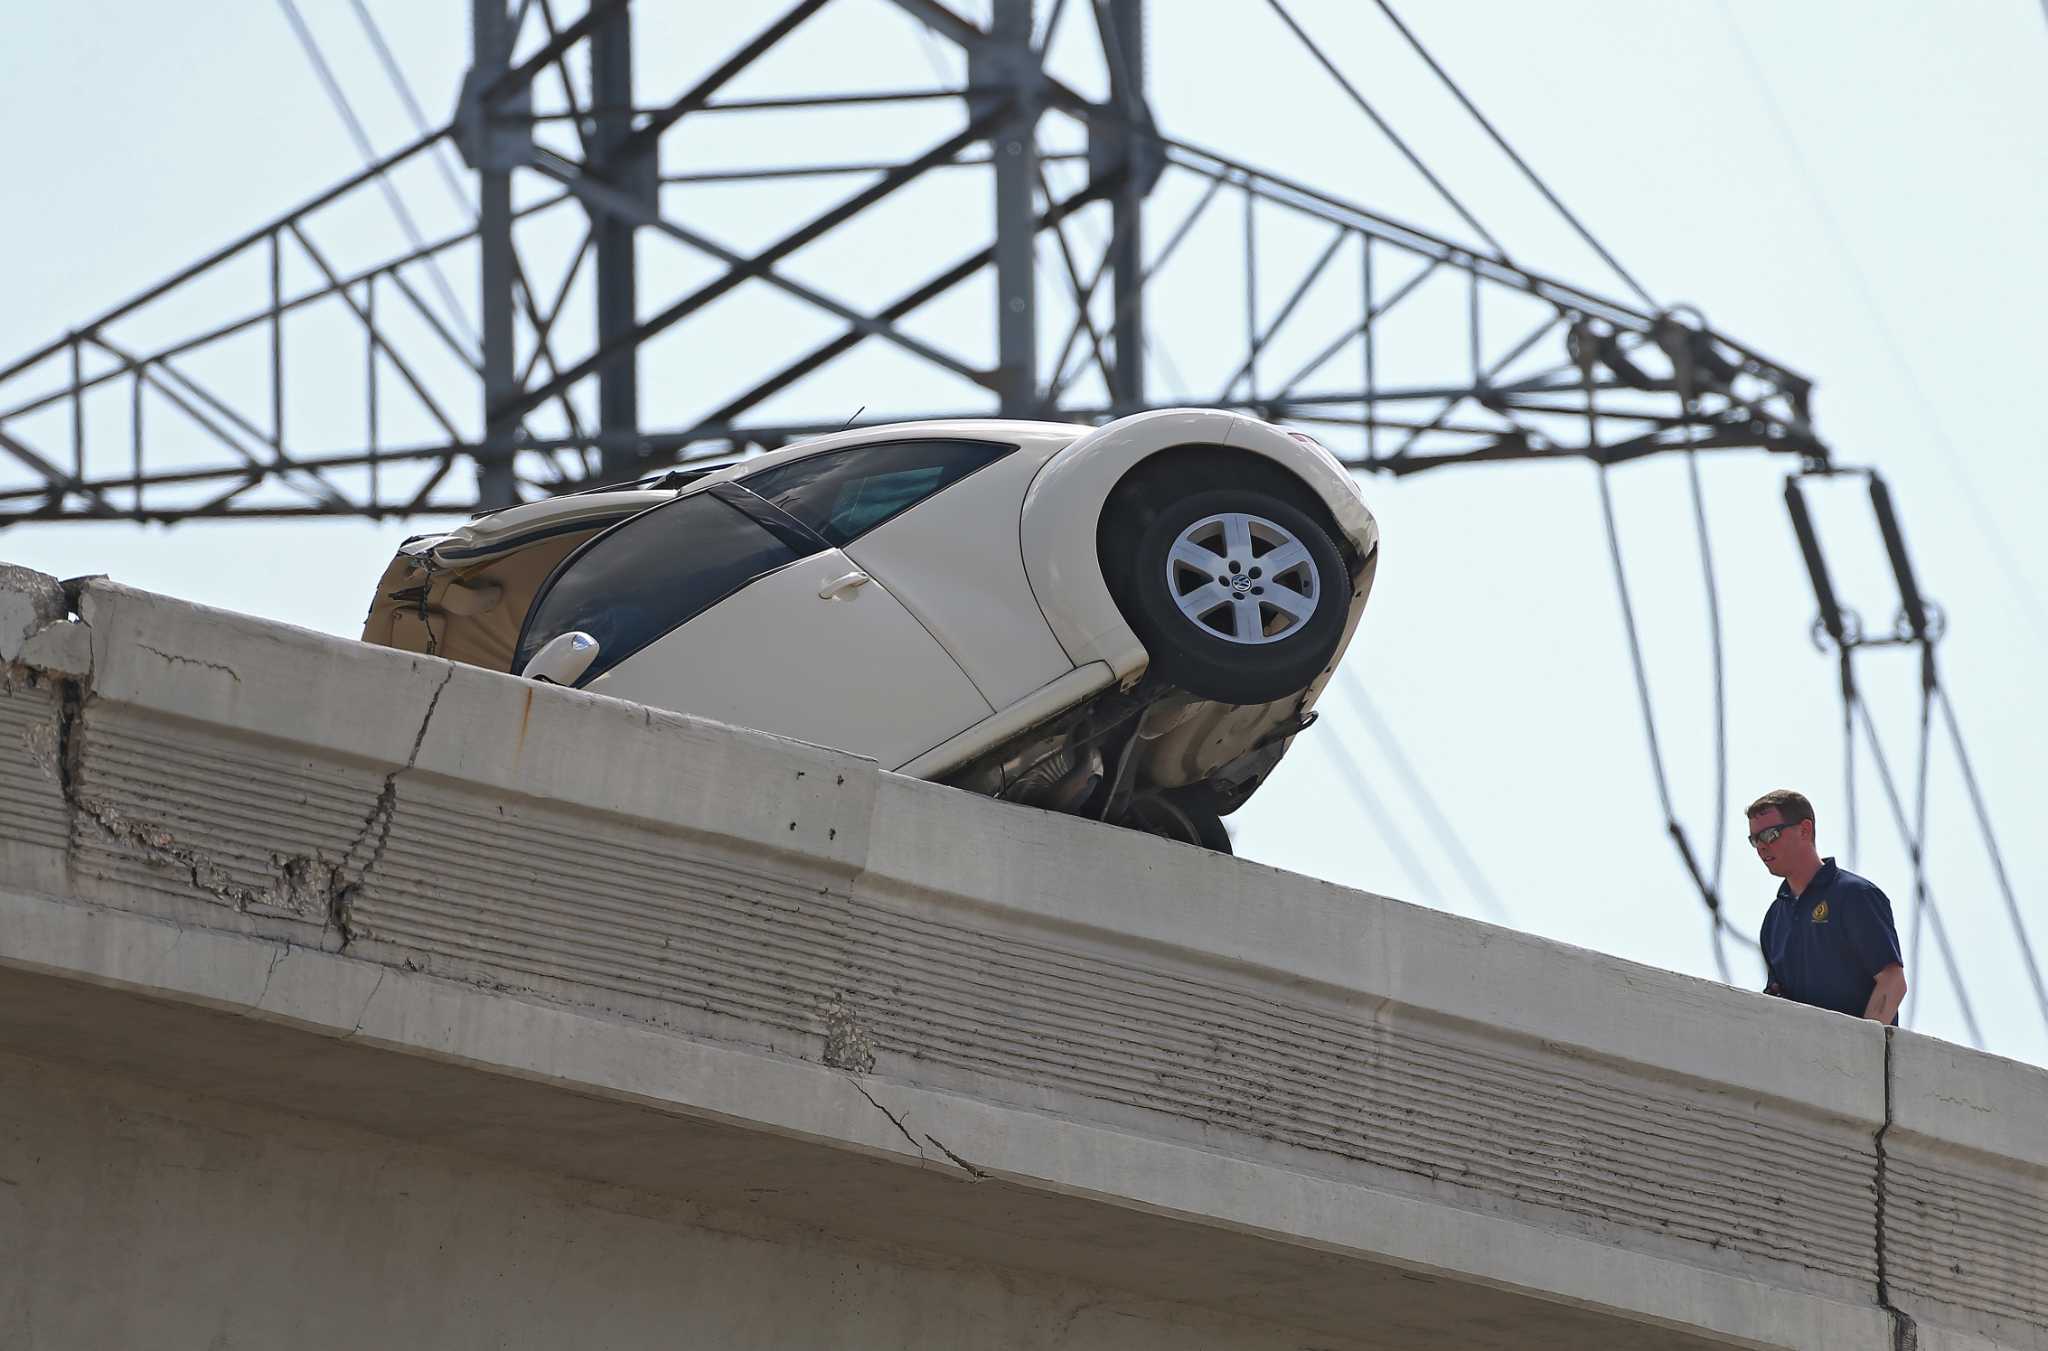 In Houston, 11 fatal wrecks, 12 deaths: An average week